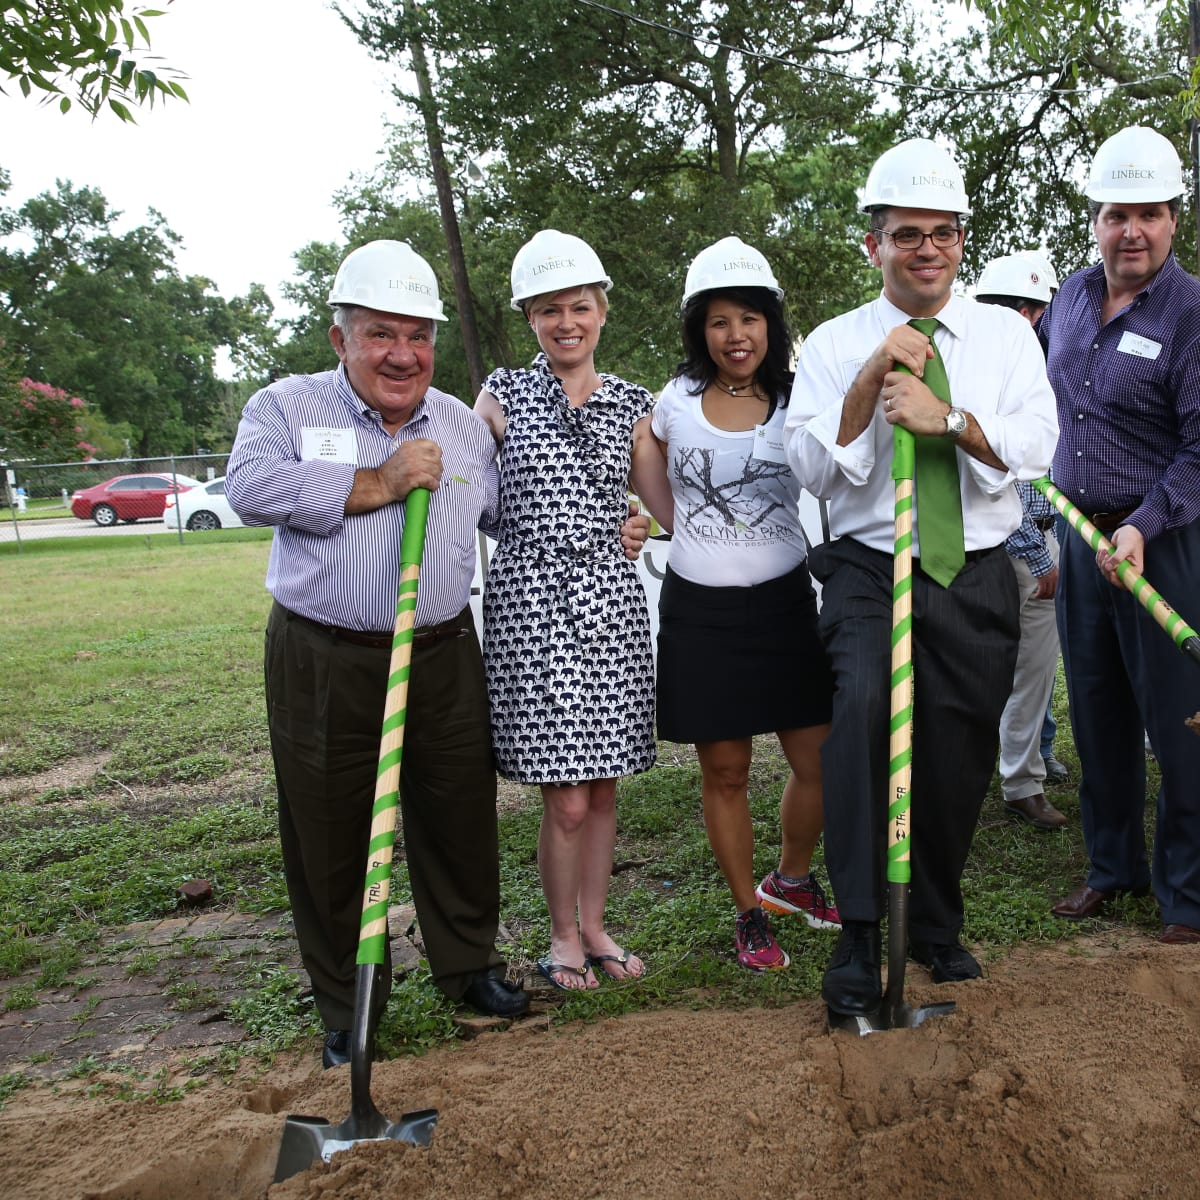 News, Shelby, Evelyn's Park groundbreaking, June 2015, Jim Avioli, Sarah Davis, Patricia Ritter king, Andrew Friedberg, Roman Reed